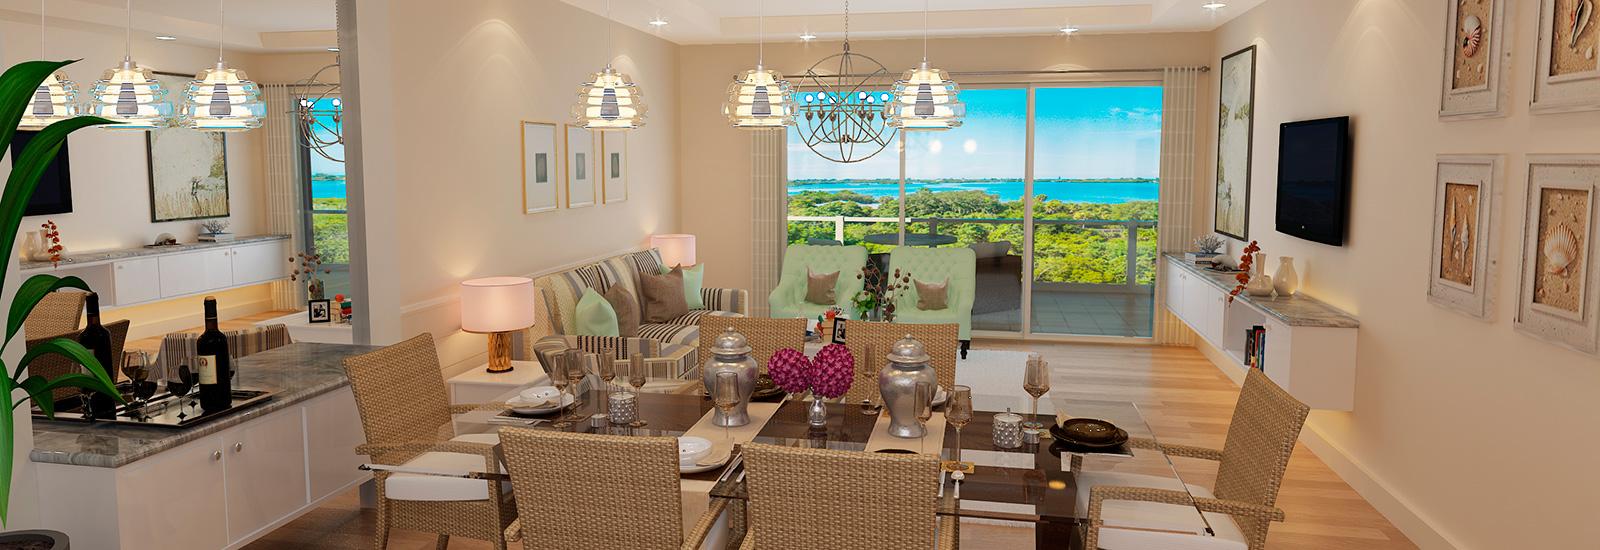 1600x550-EdgewaterHB-dining_view.jpg